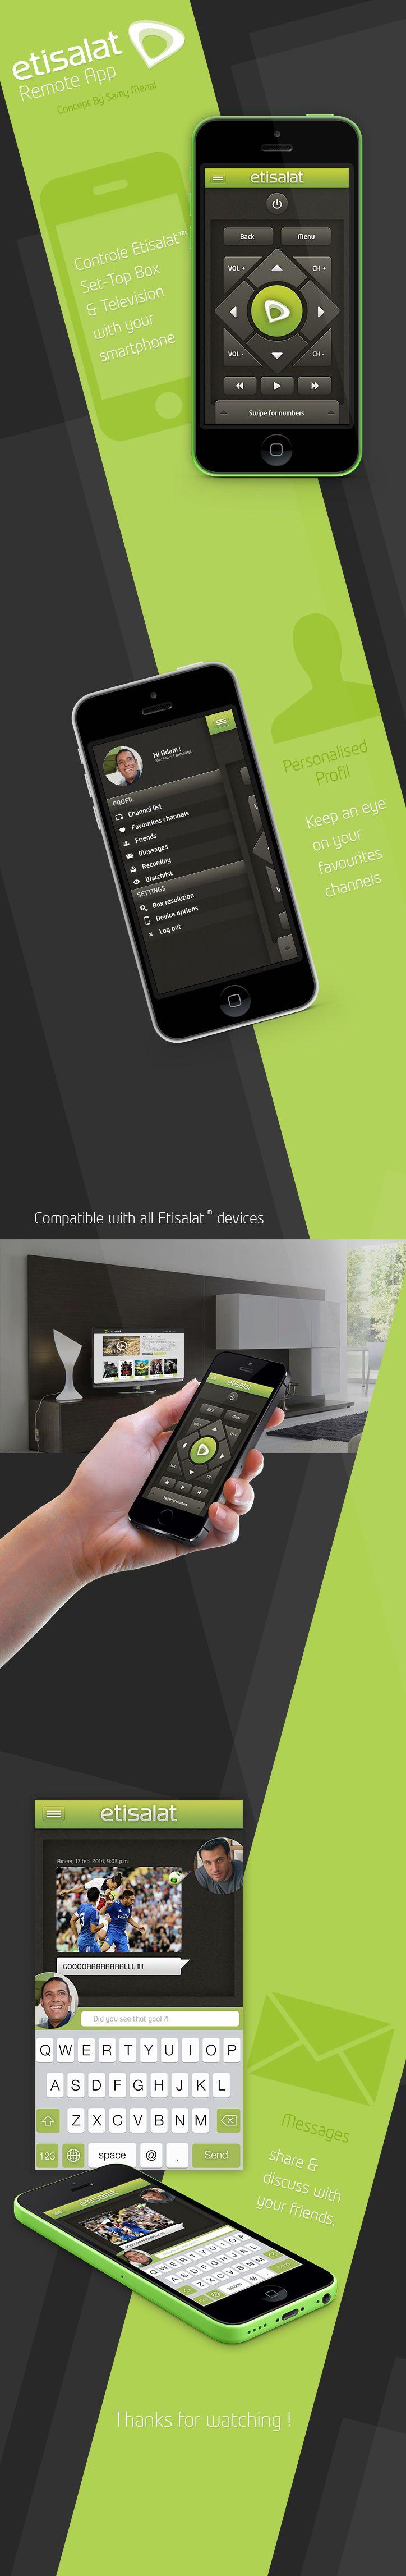 Etisalat Remote App Concept | UI / UX